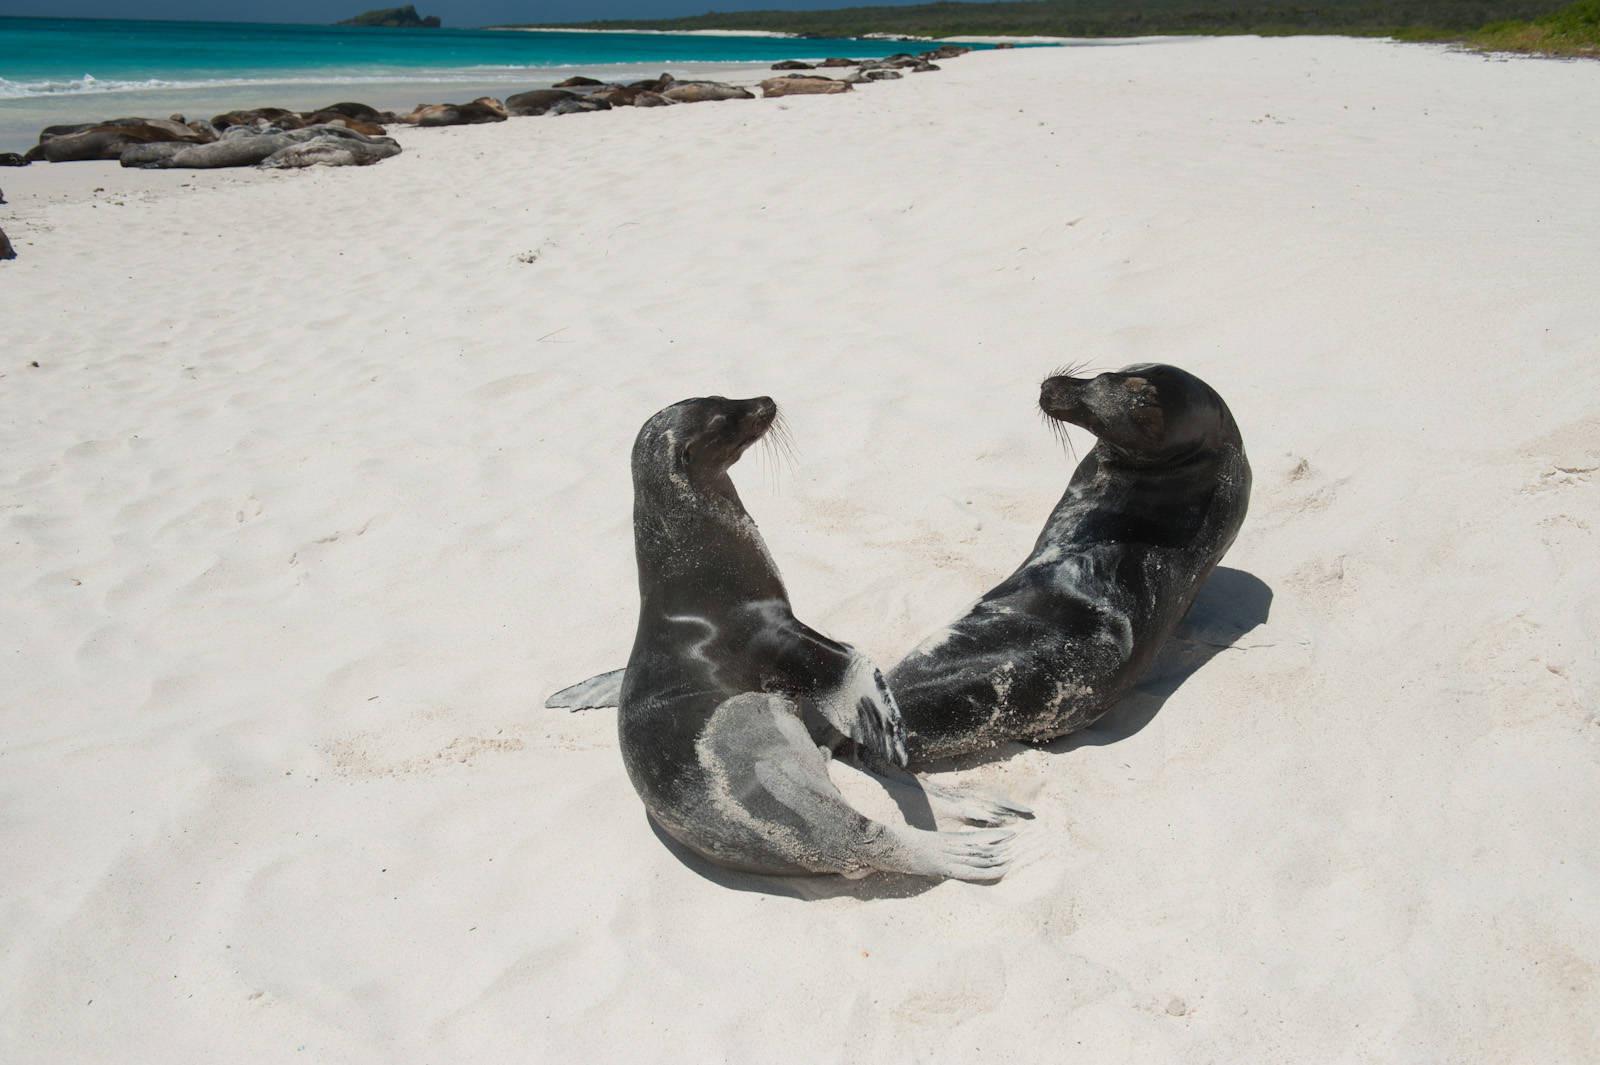 Photo: Galapagos sea lions (Zalophus wollebaeki) on Espanola Island in Galapagos National Park.